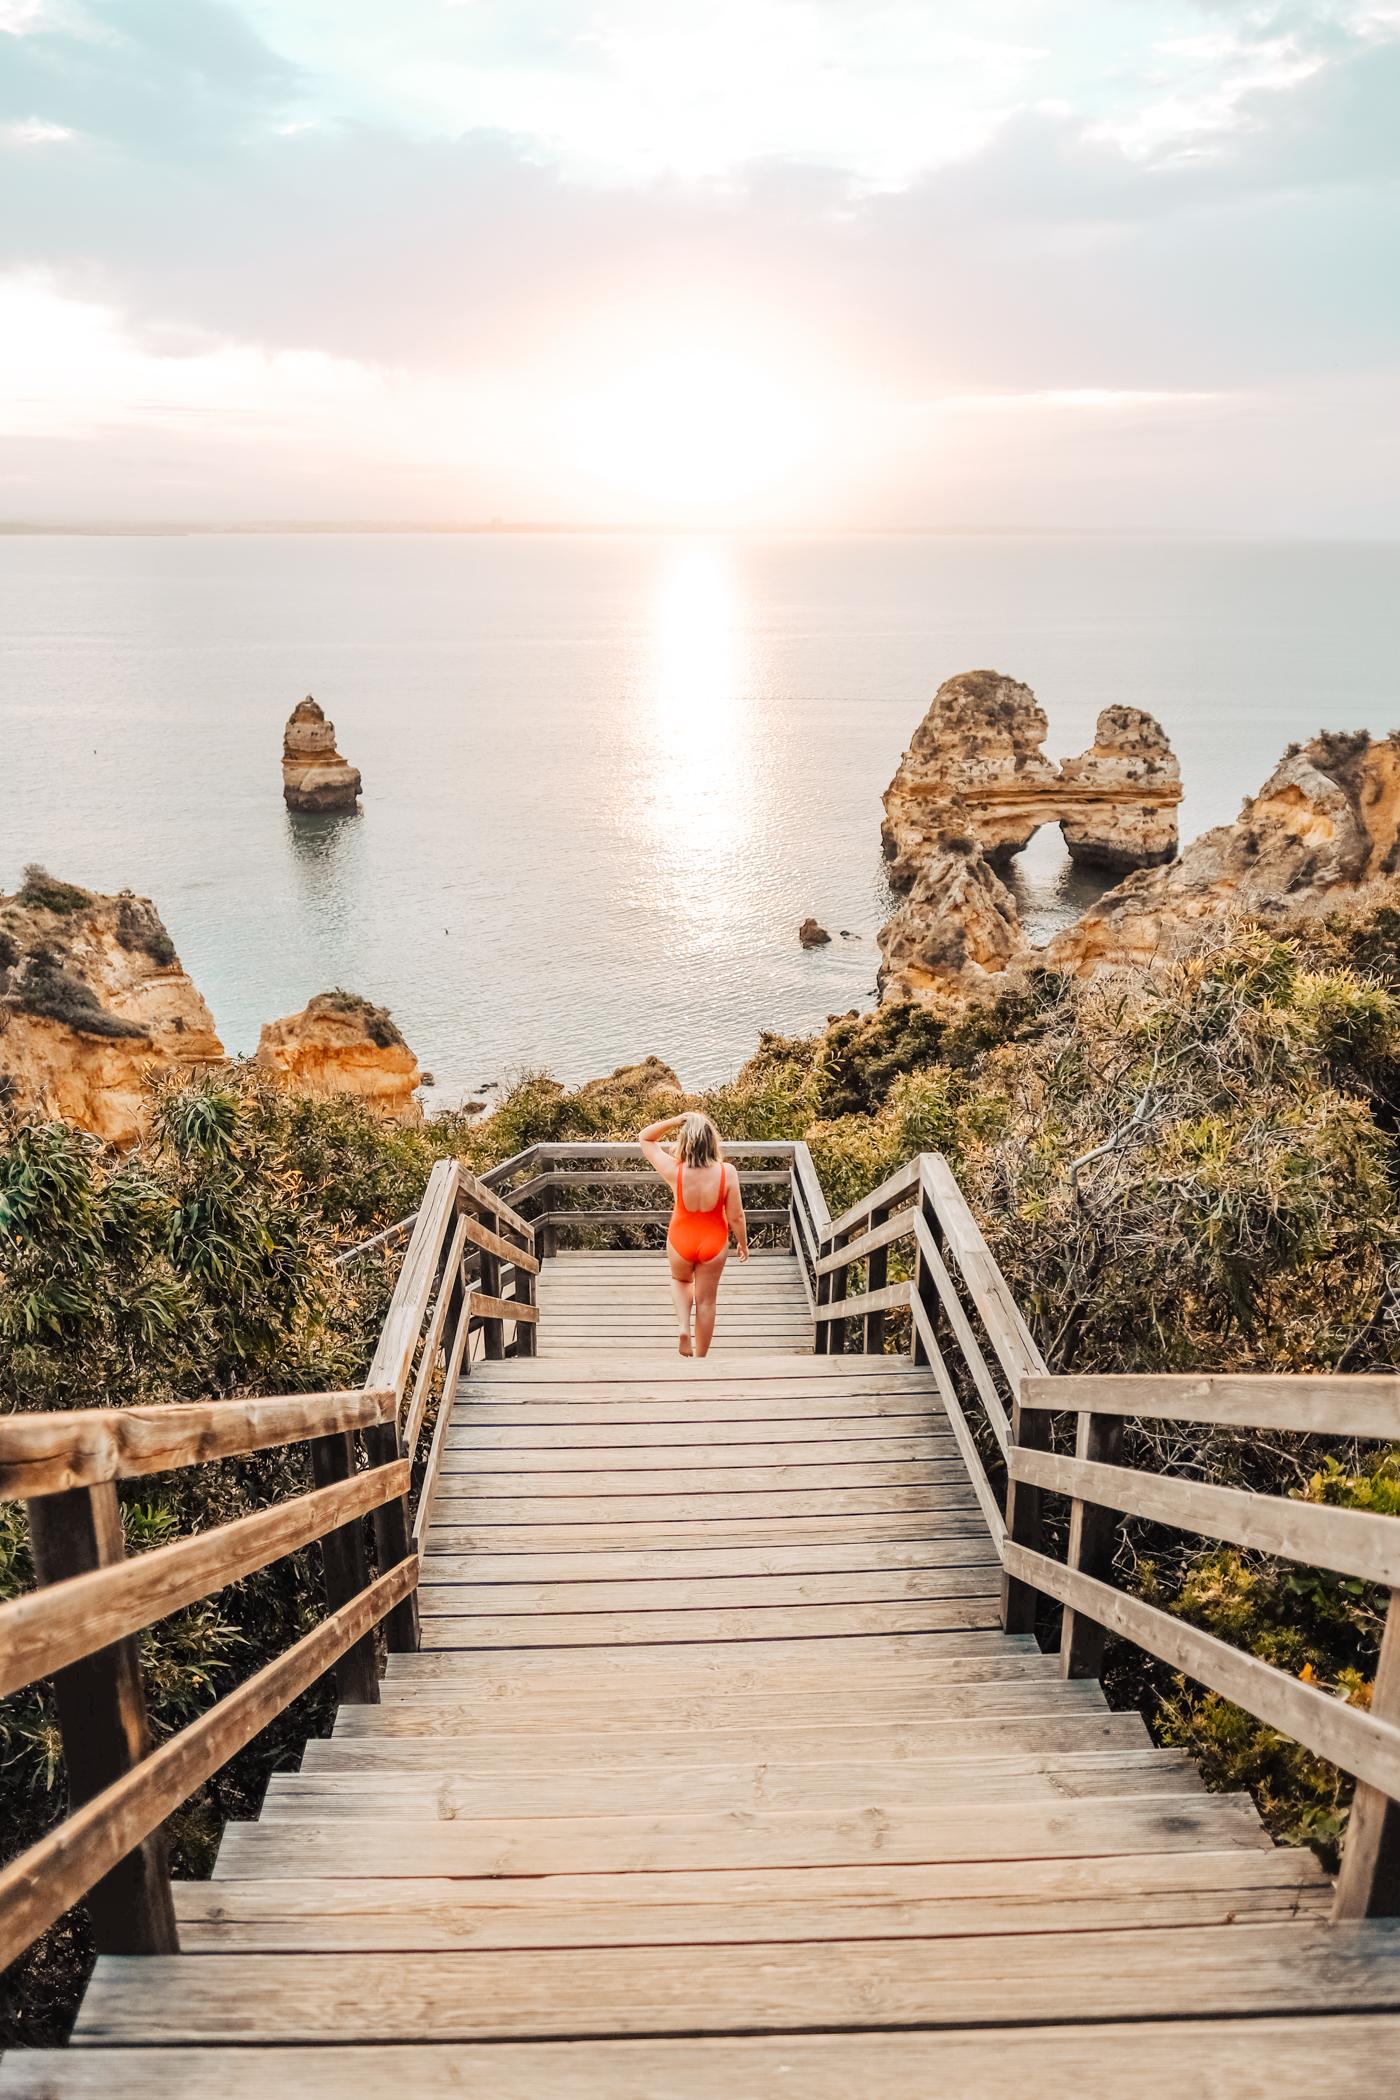 Solo Travel in Portugal: My Trip to Lagos, Lisbon & Porto